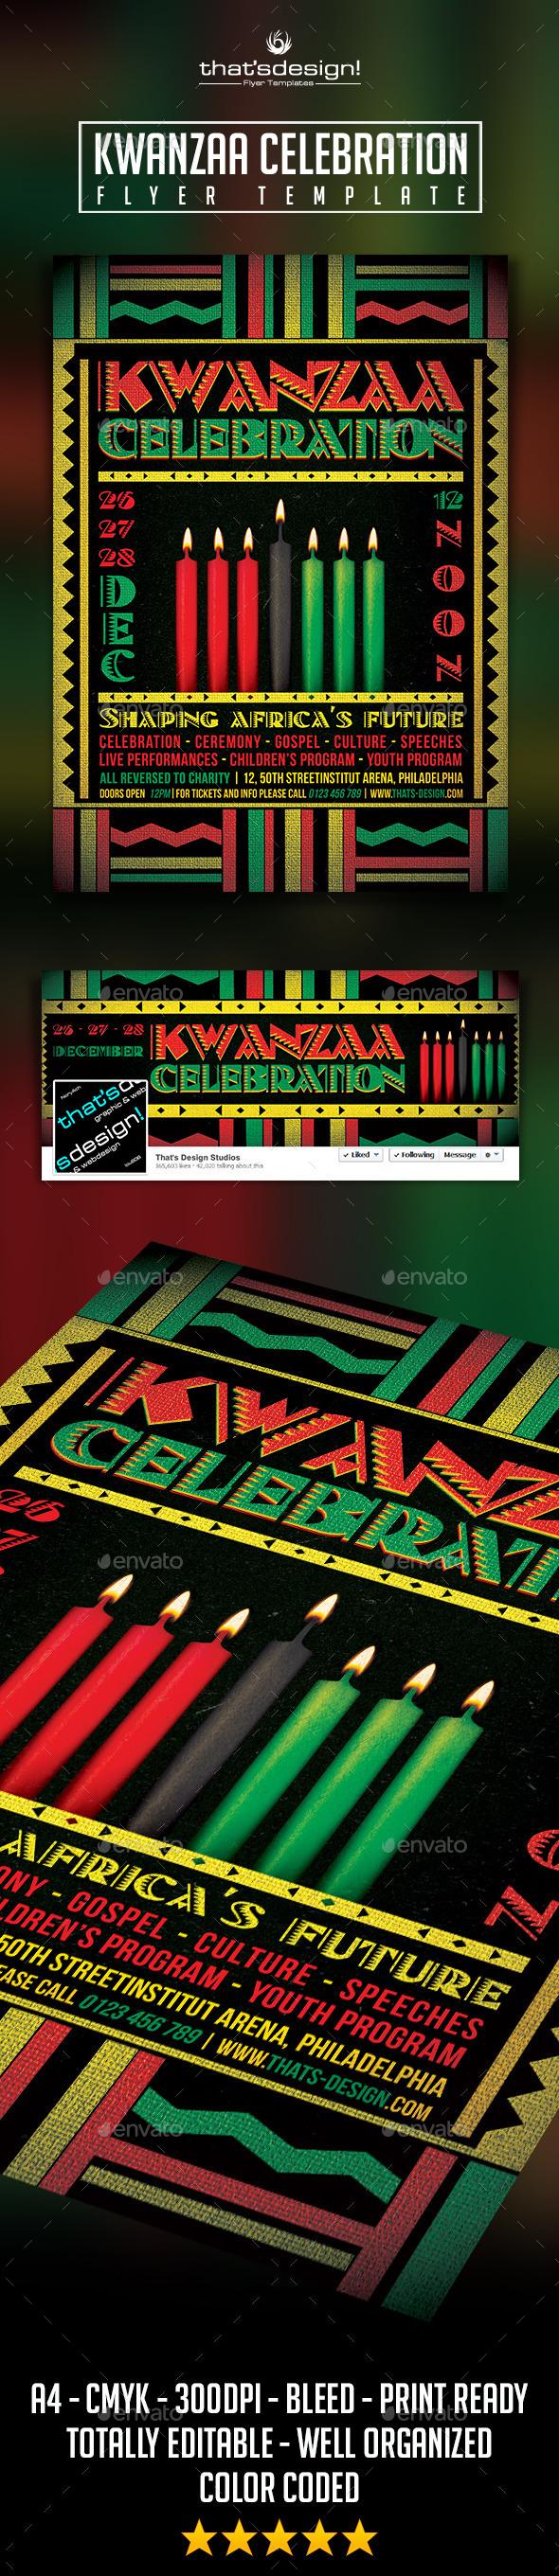 GraphicRiver Kwanzaa Flyer Template 9461472